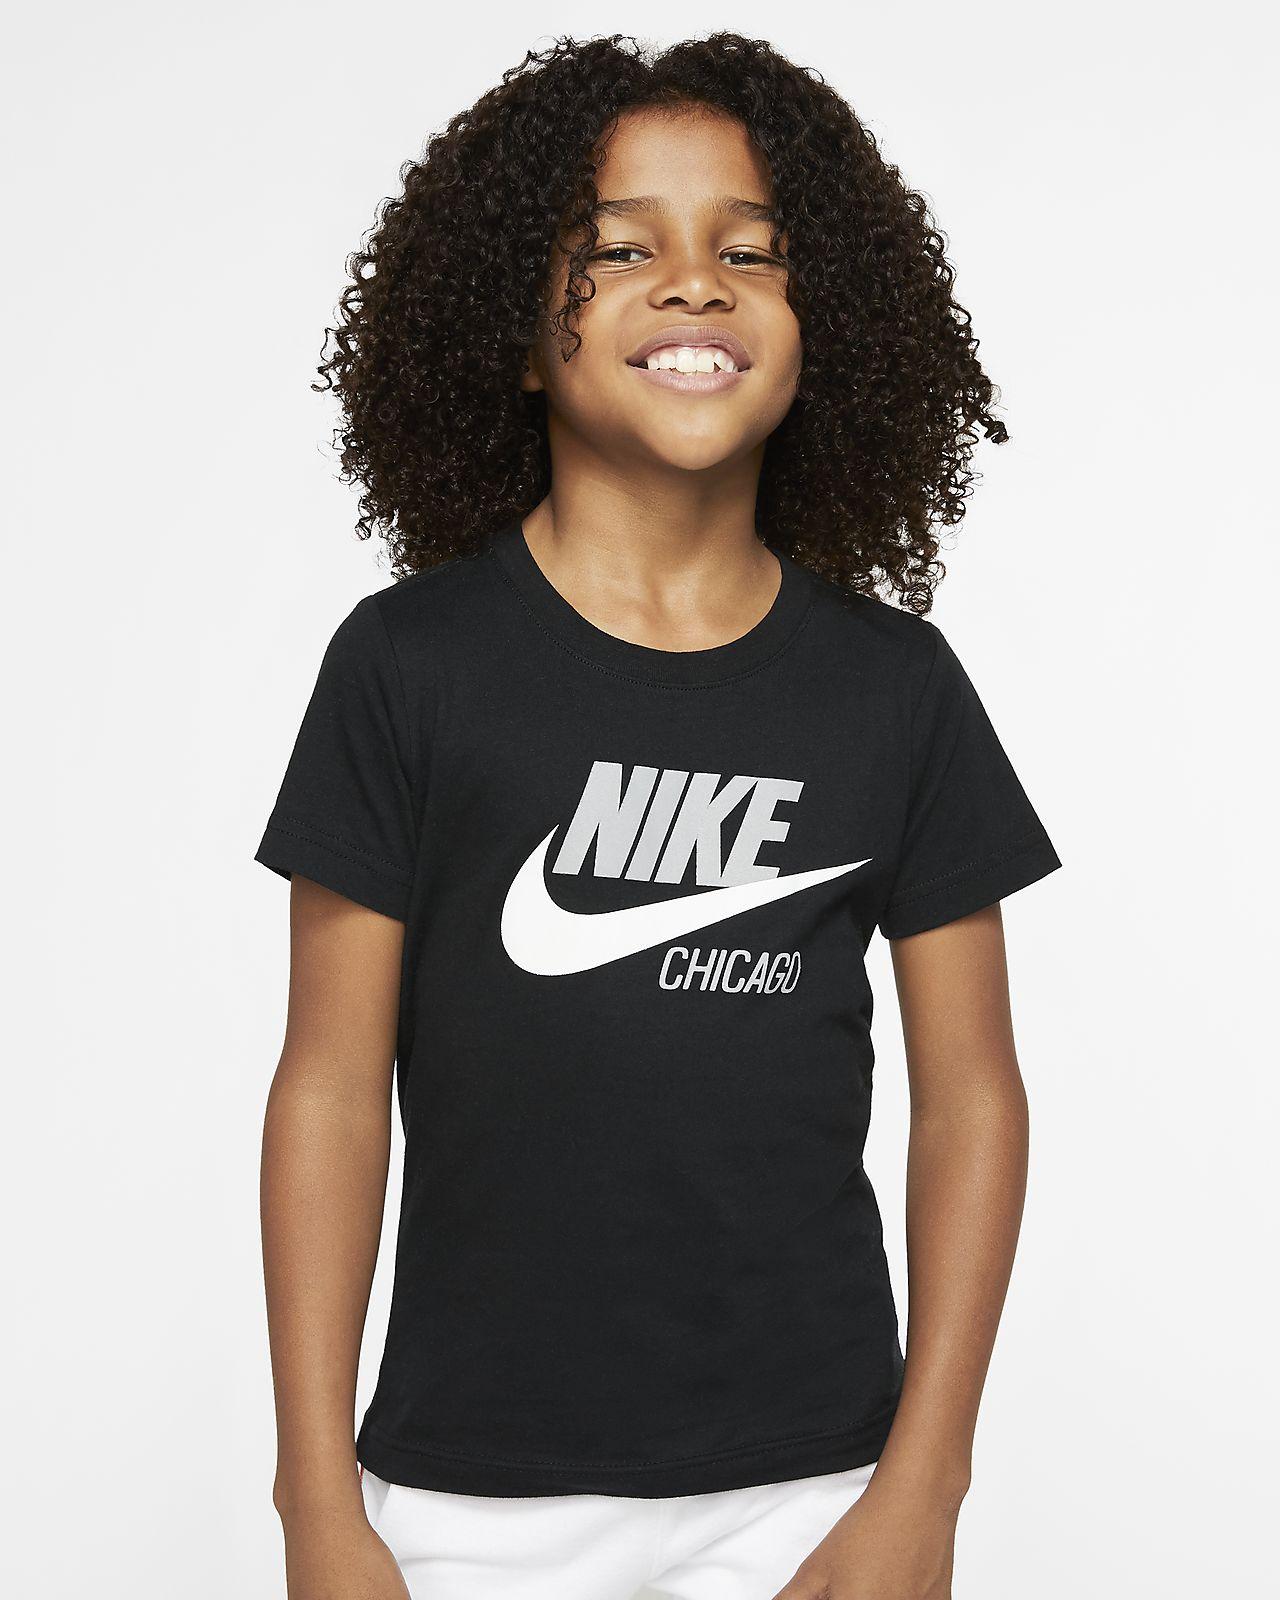 Nike Sportswear Chicago Little Kids' Short-Sleeve T-Shirt